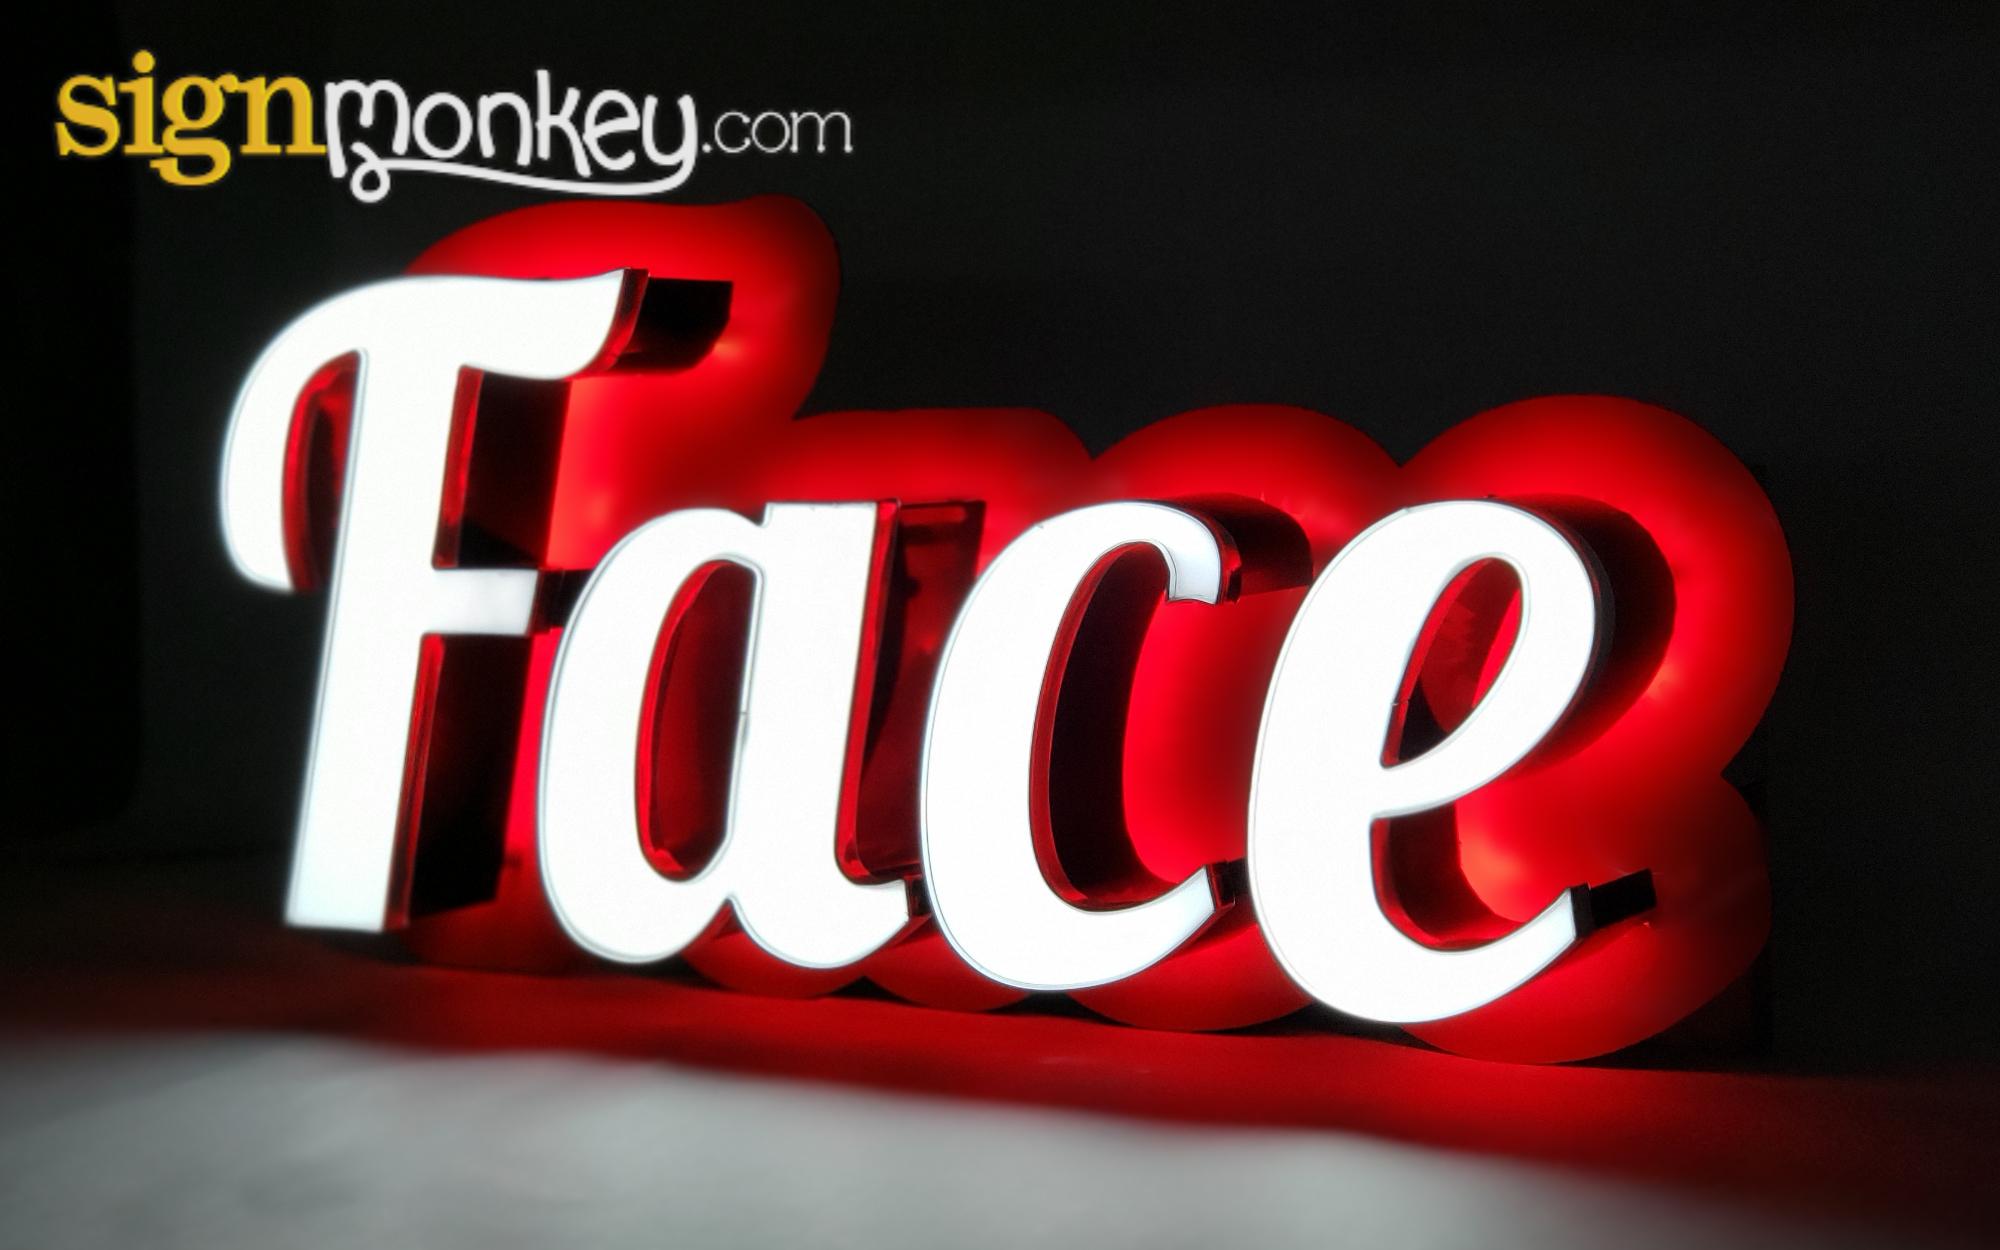 Face & Halo Lit LED Sign Construction